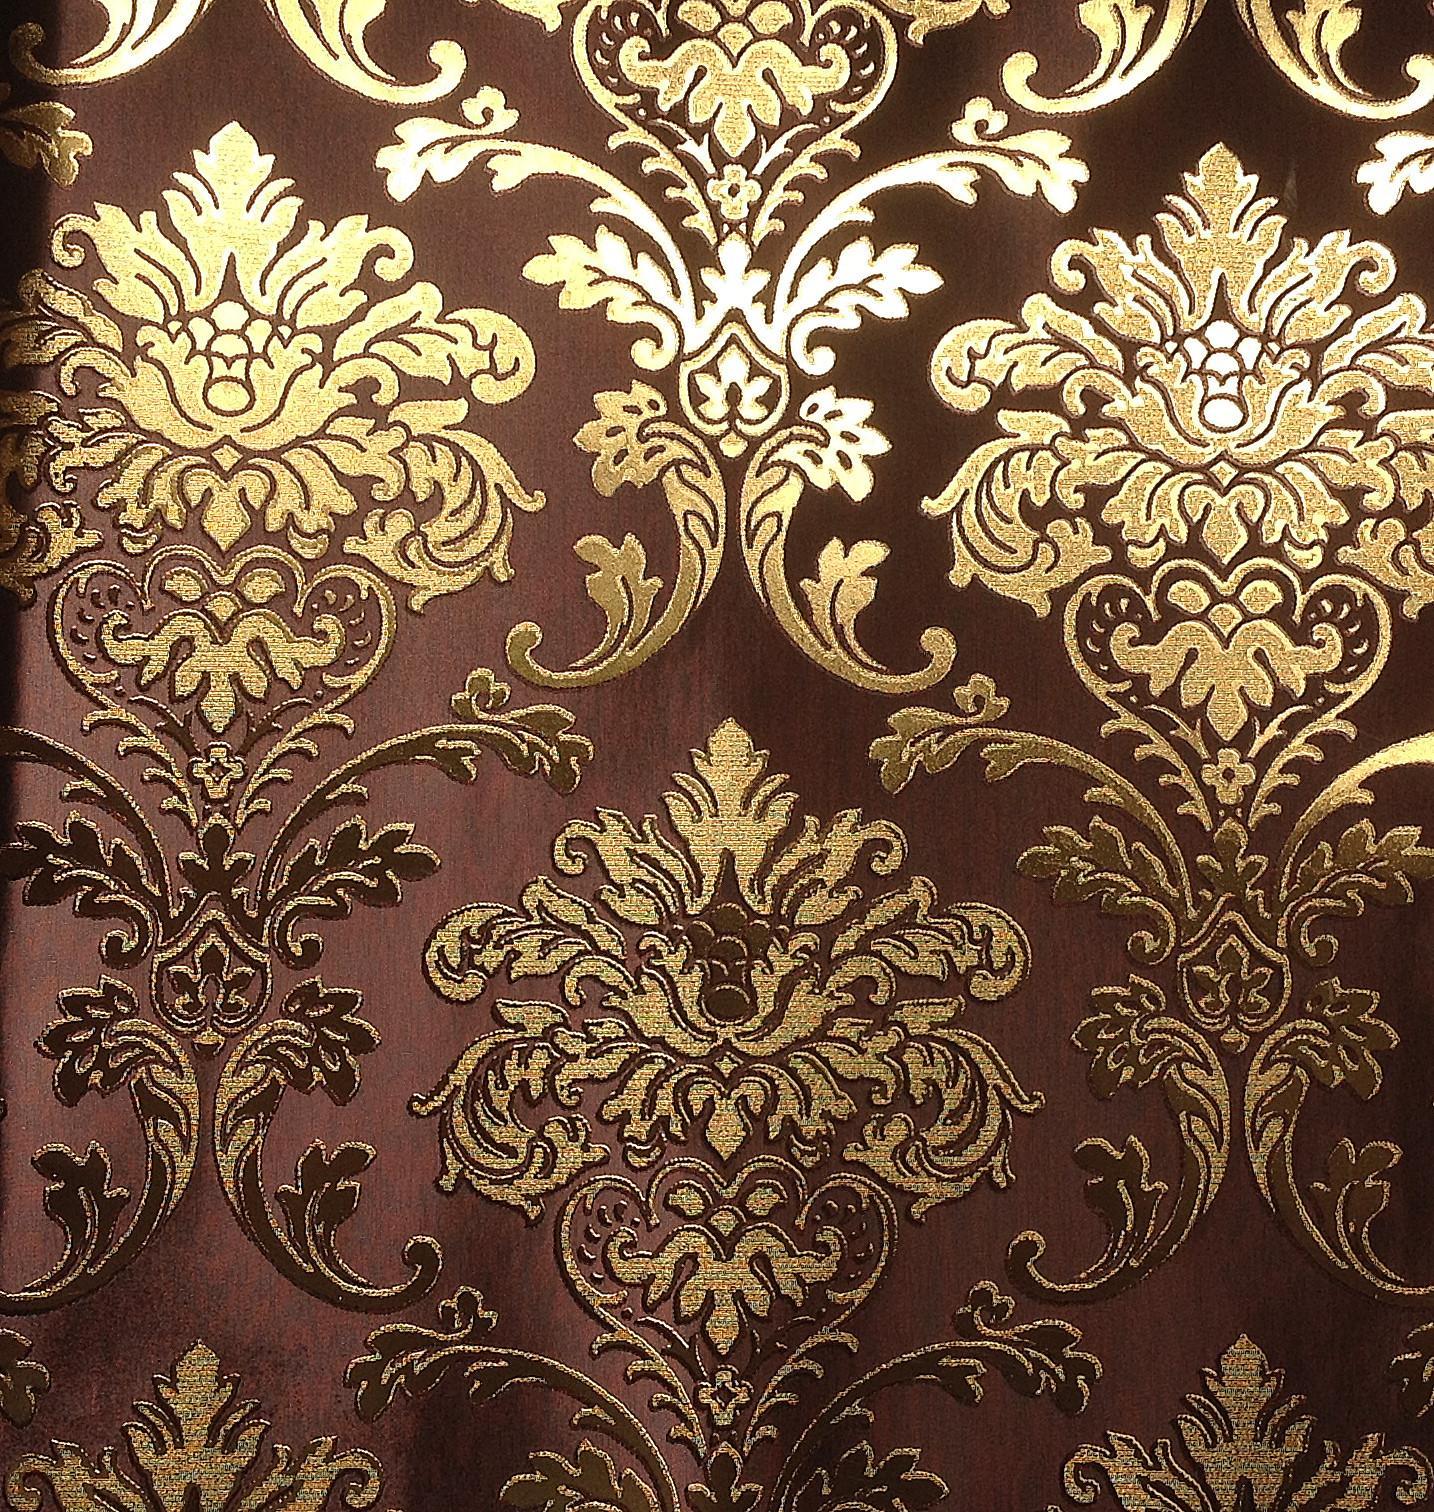 Lt6 60403 Fashion European Modern Style Wall Paper Luxury Vinyl Gold Foil Gold Decorative